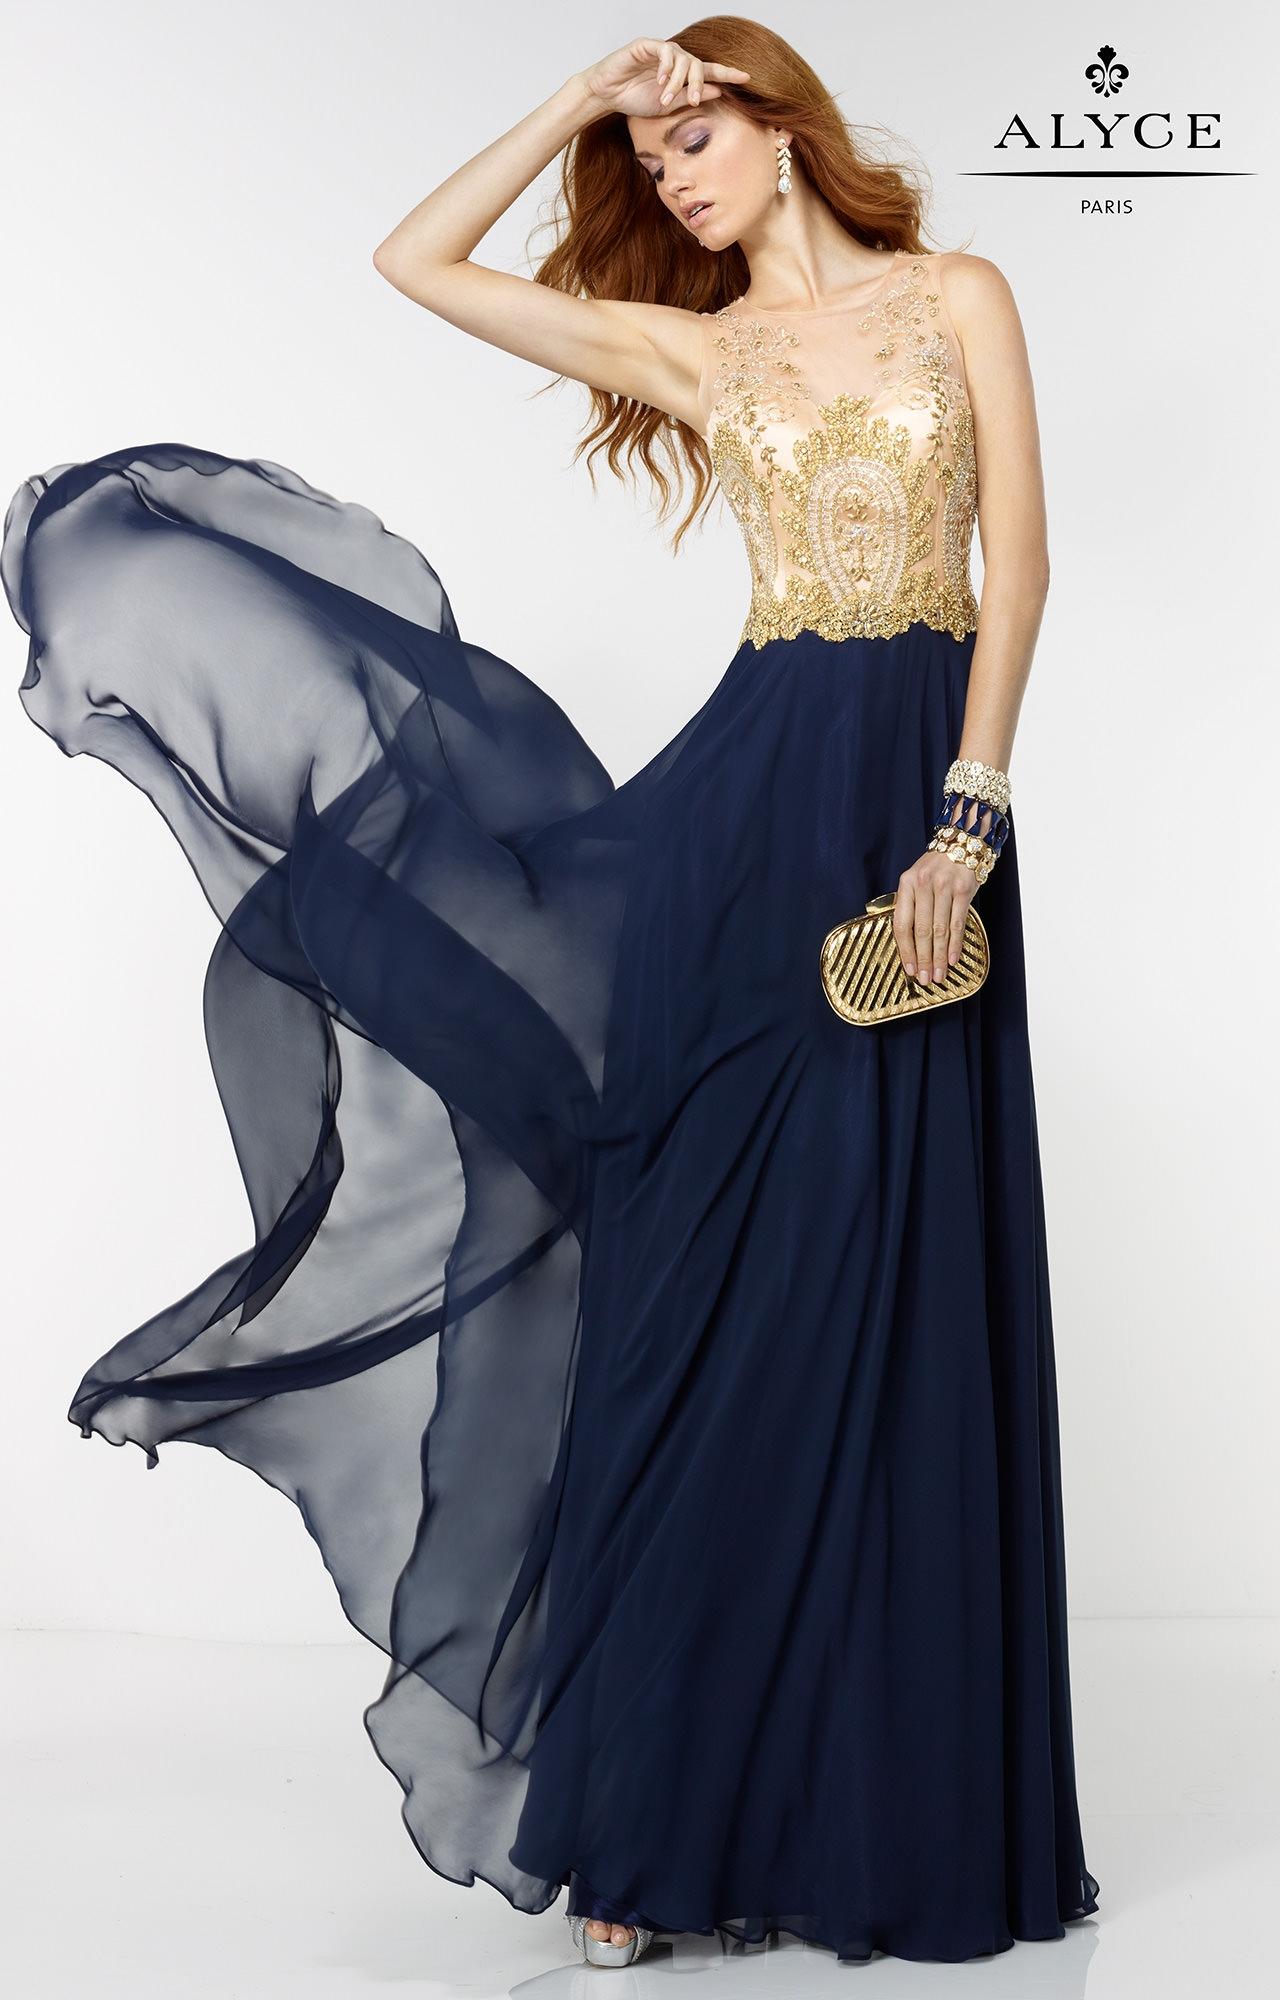 Alyce Paris 6527 Elegance Is Her Name Dress Prom Dress